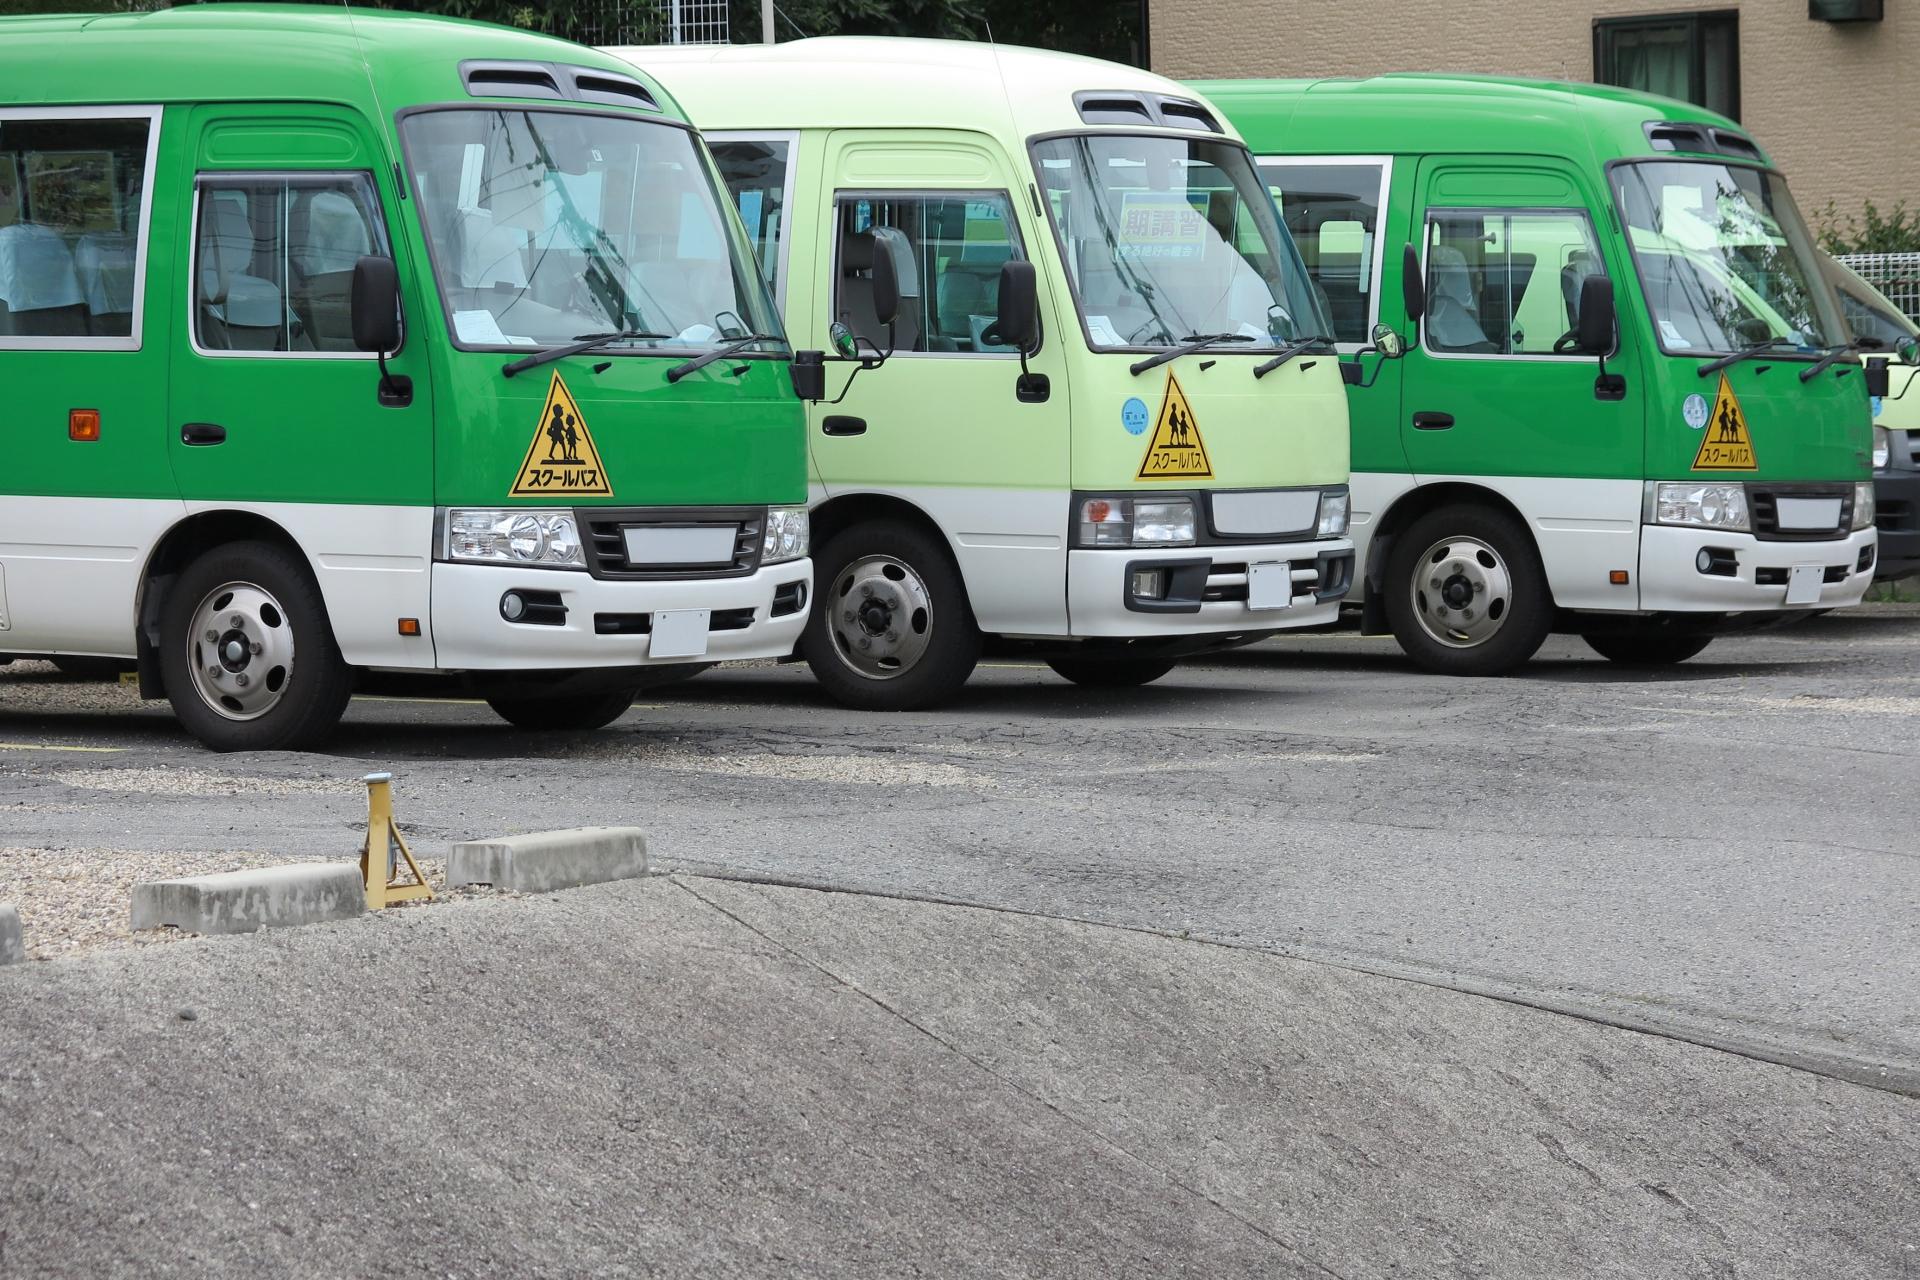 【IoT活用事例】送迎バスの位置情報管理事例